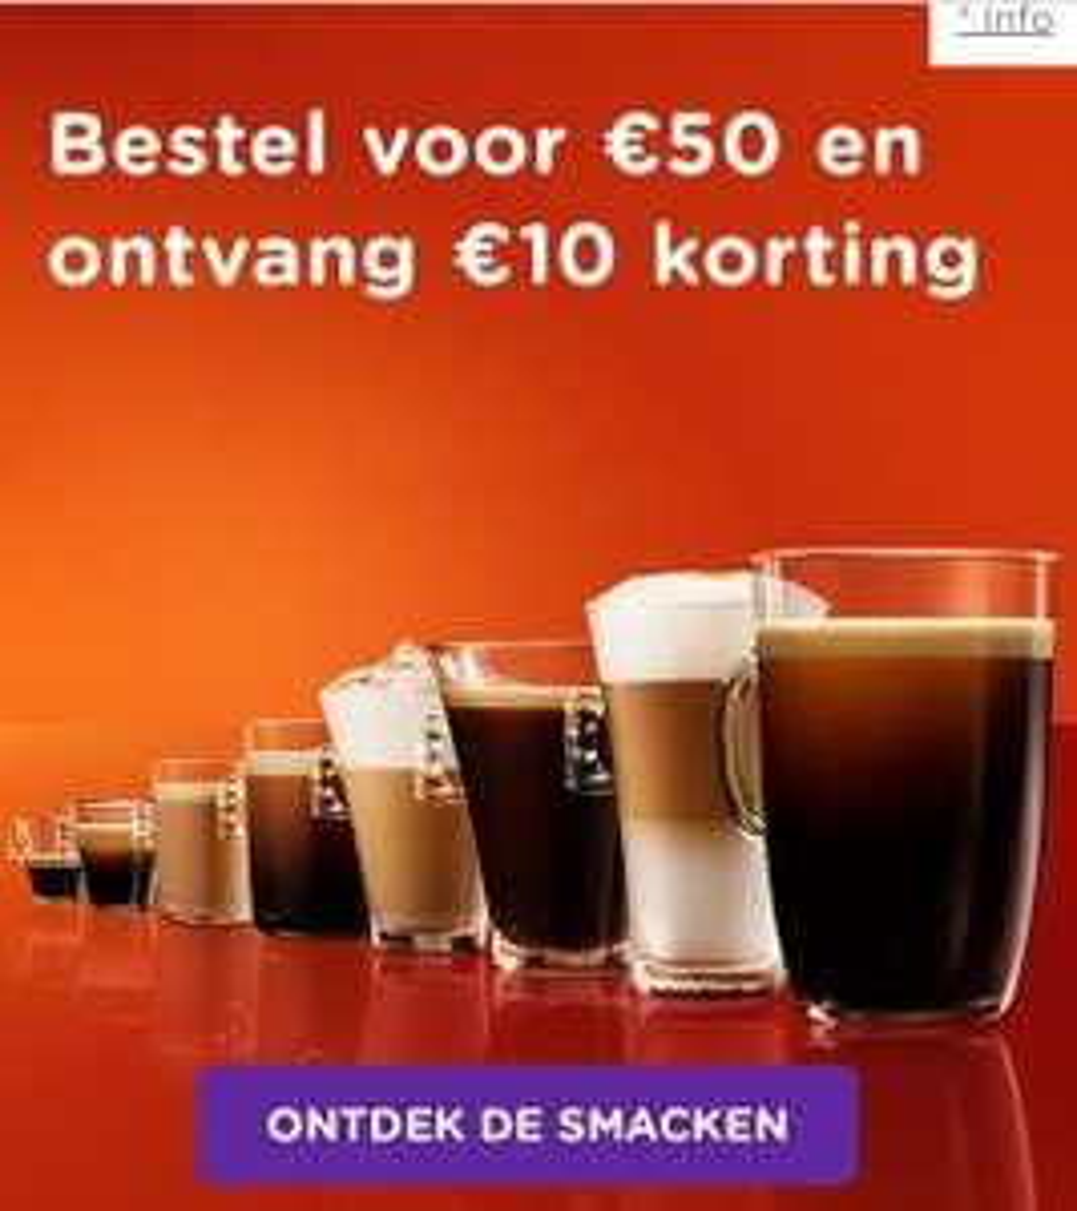 €10 korting vanaf €50 aan capsules bij Dolce Gusto